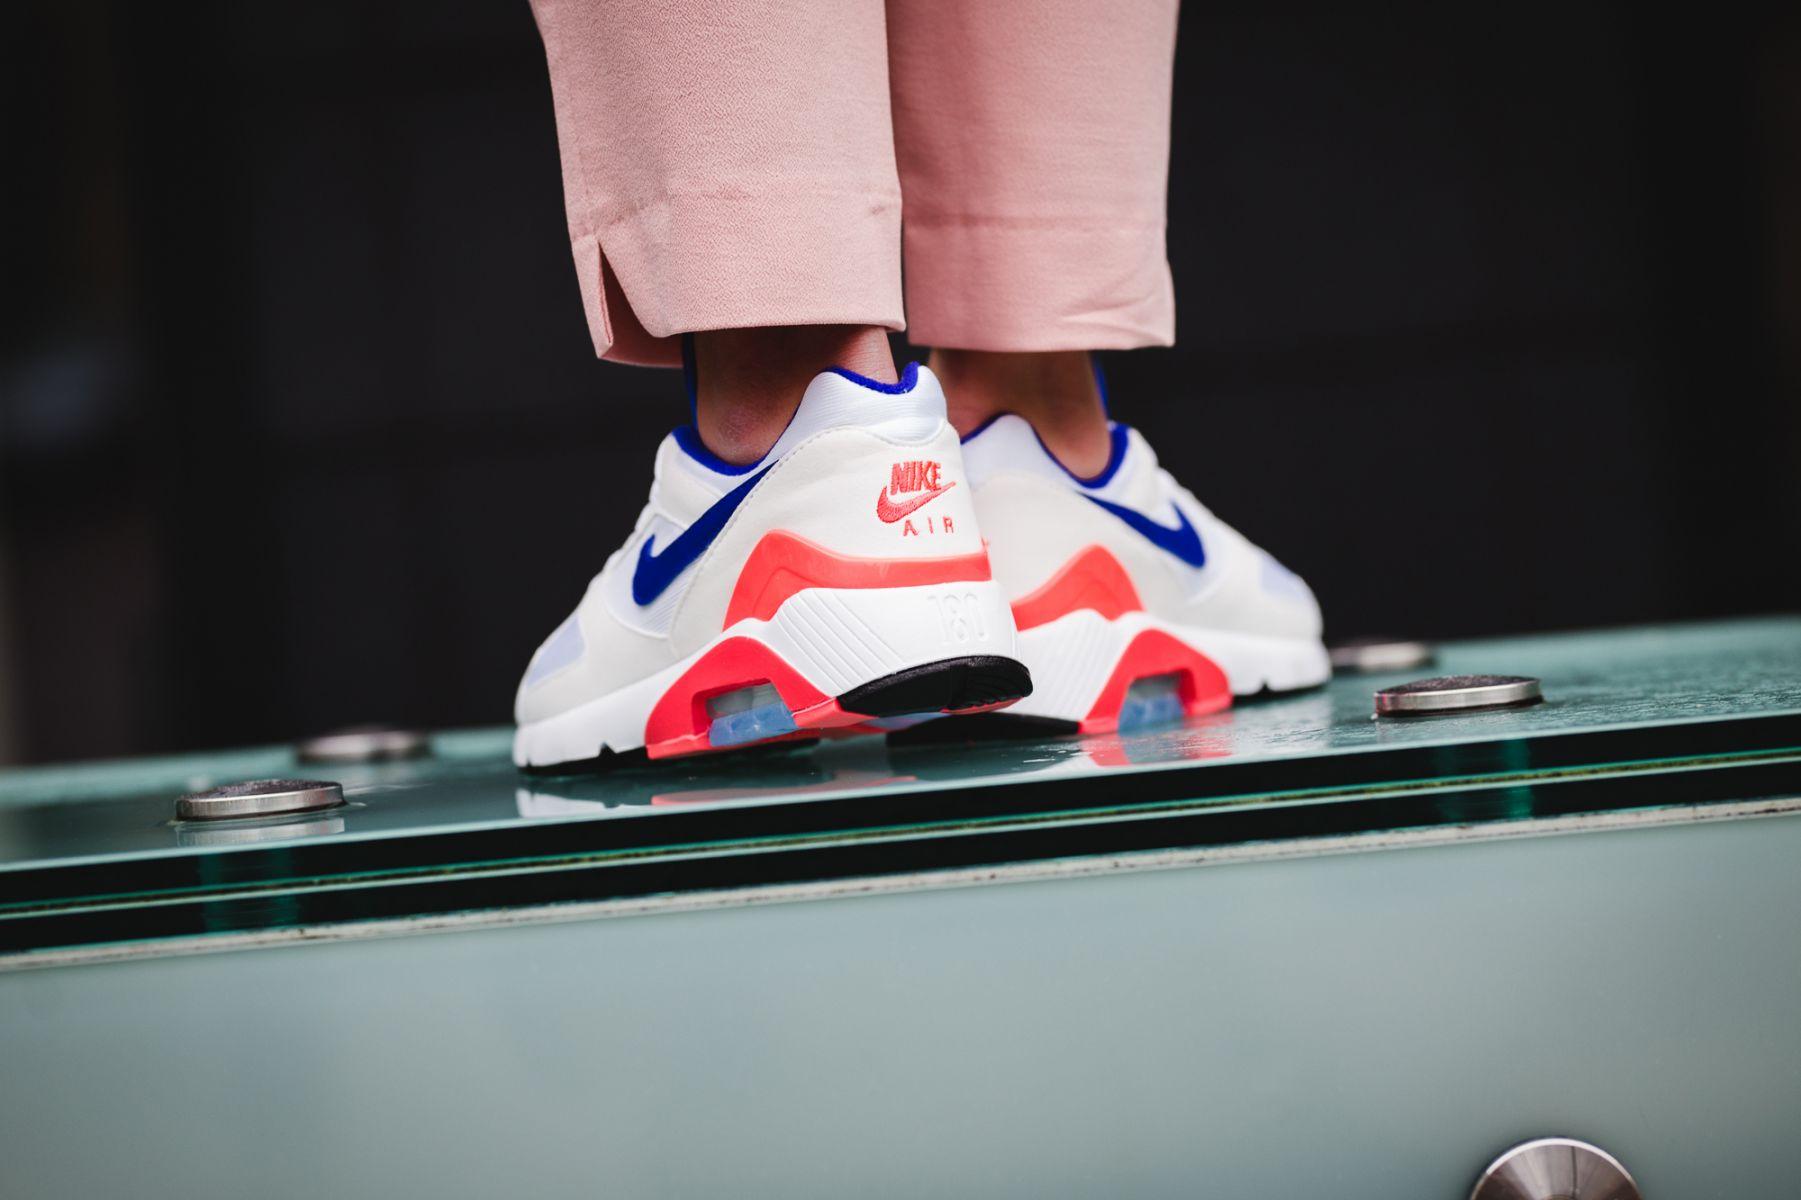 Nike Air 180 Ultramarine